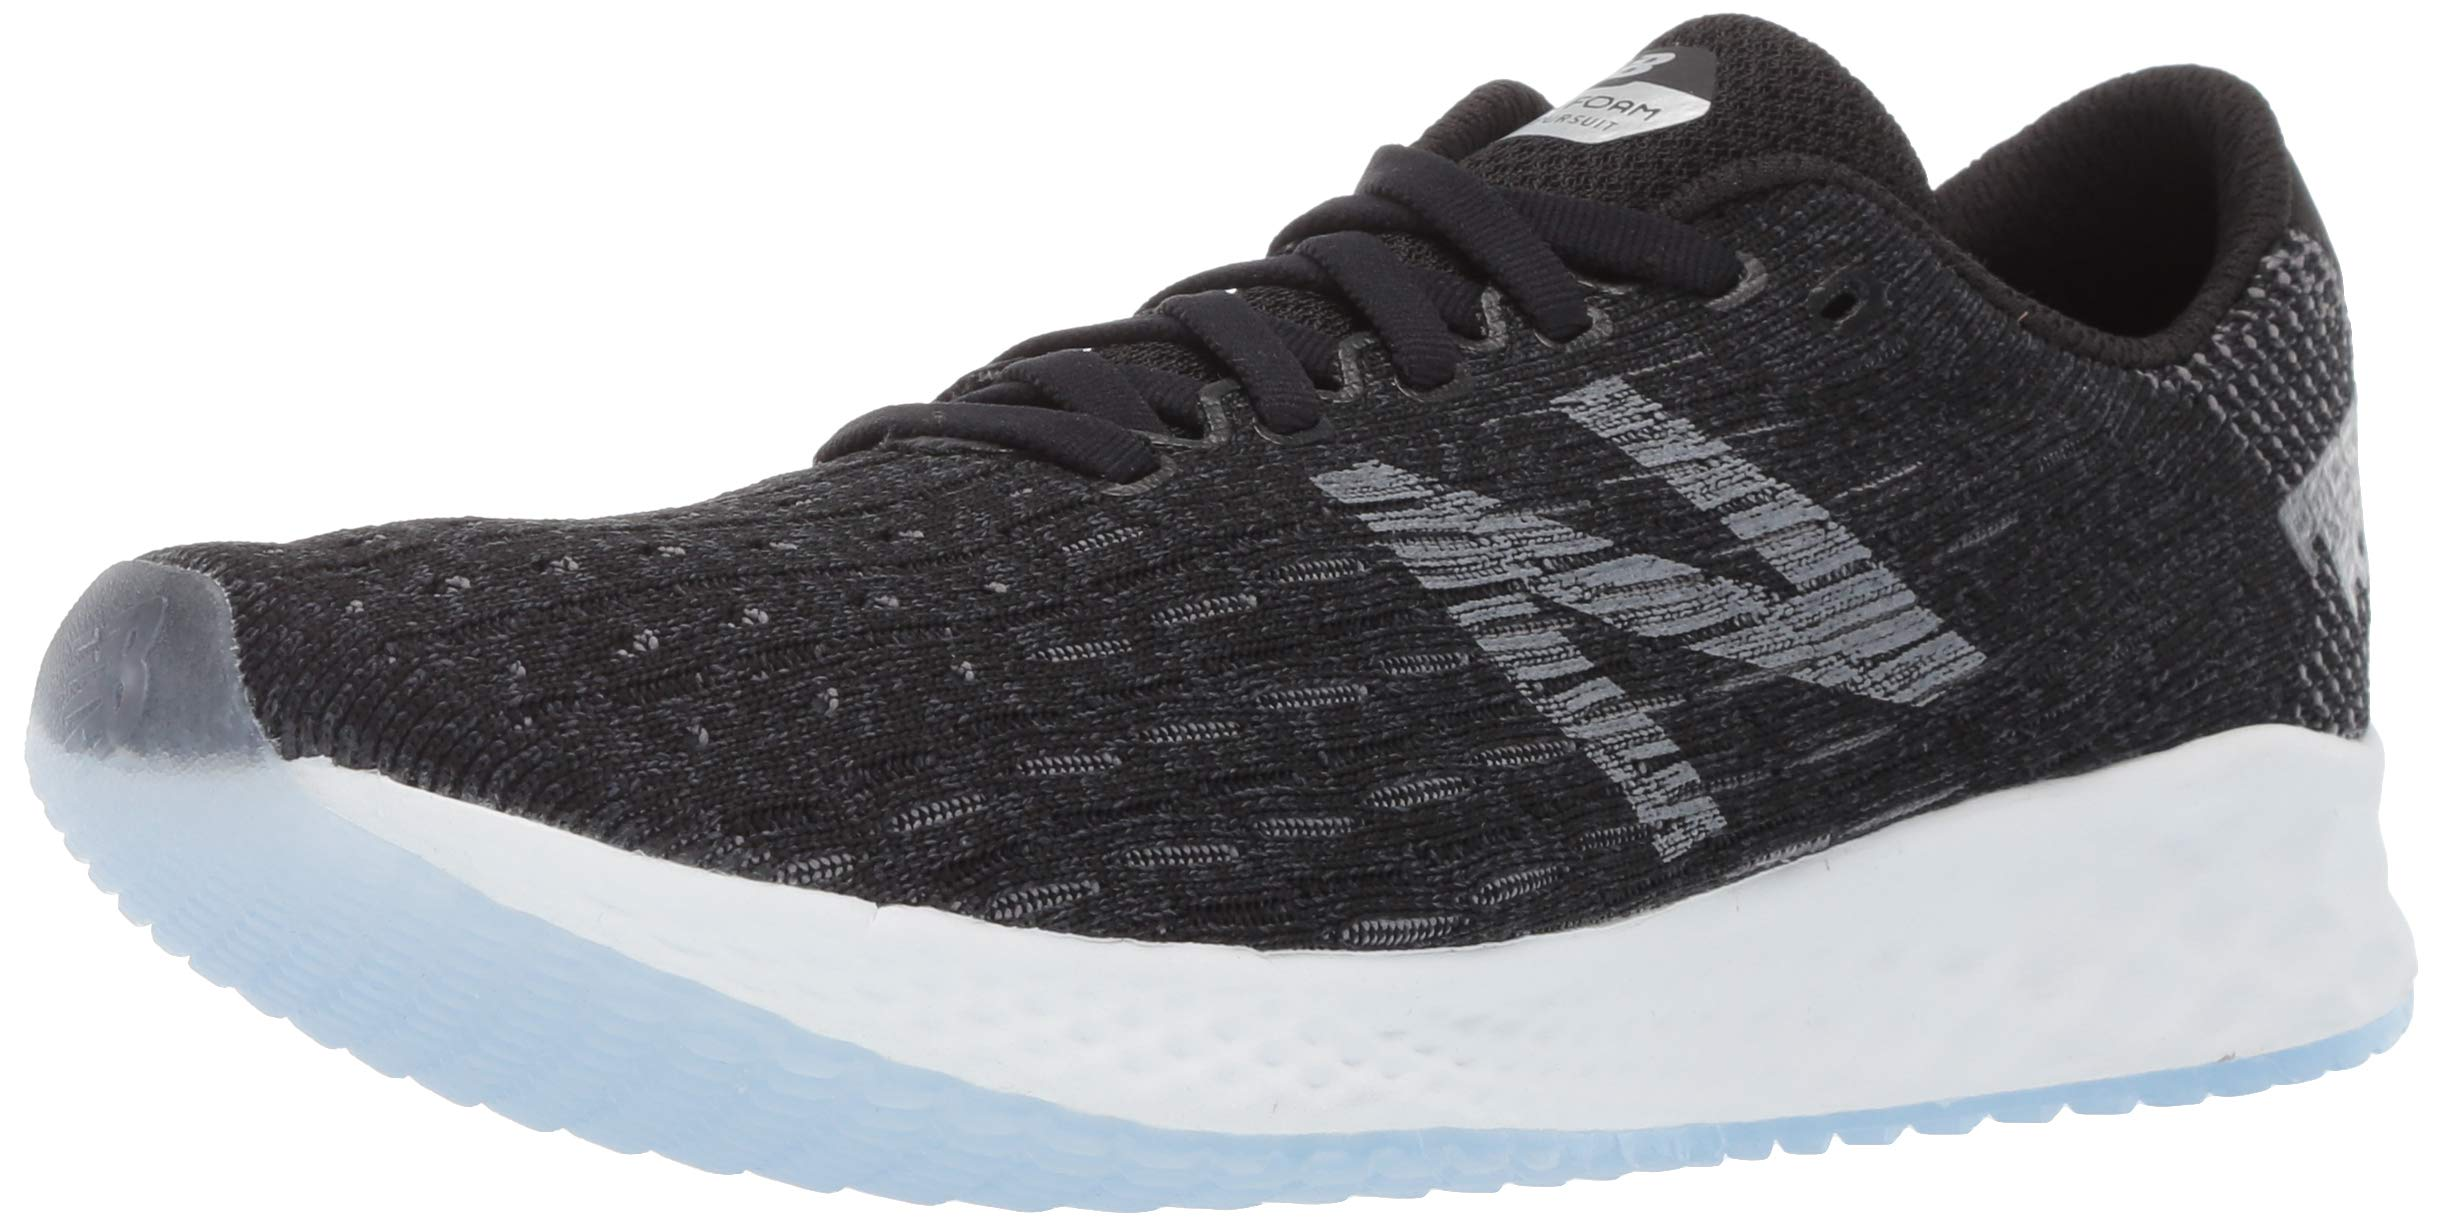 Mejor vendido Nike Tanjun Zapatillas bajas Mujer Azul Outlet